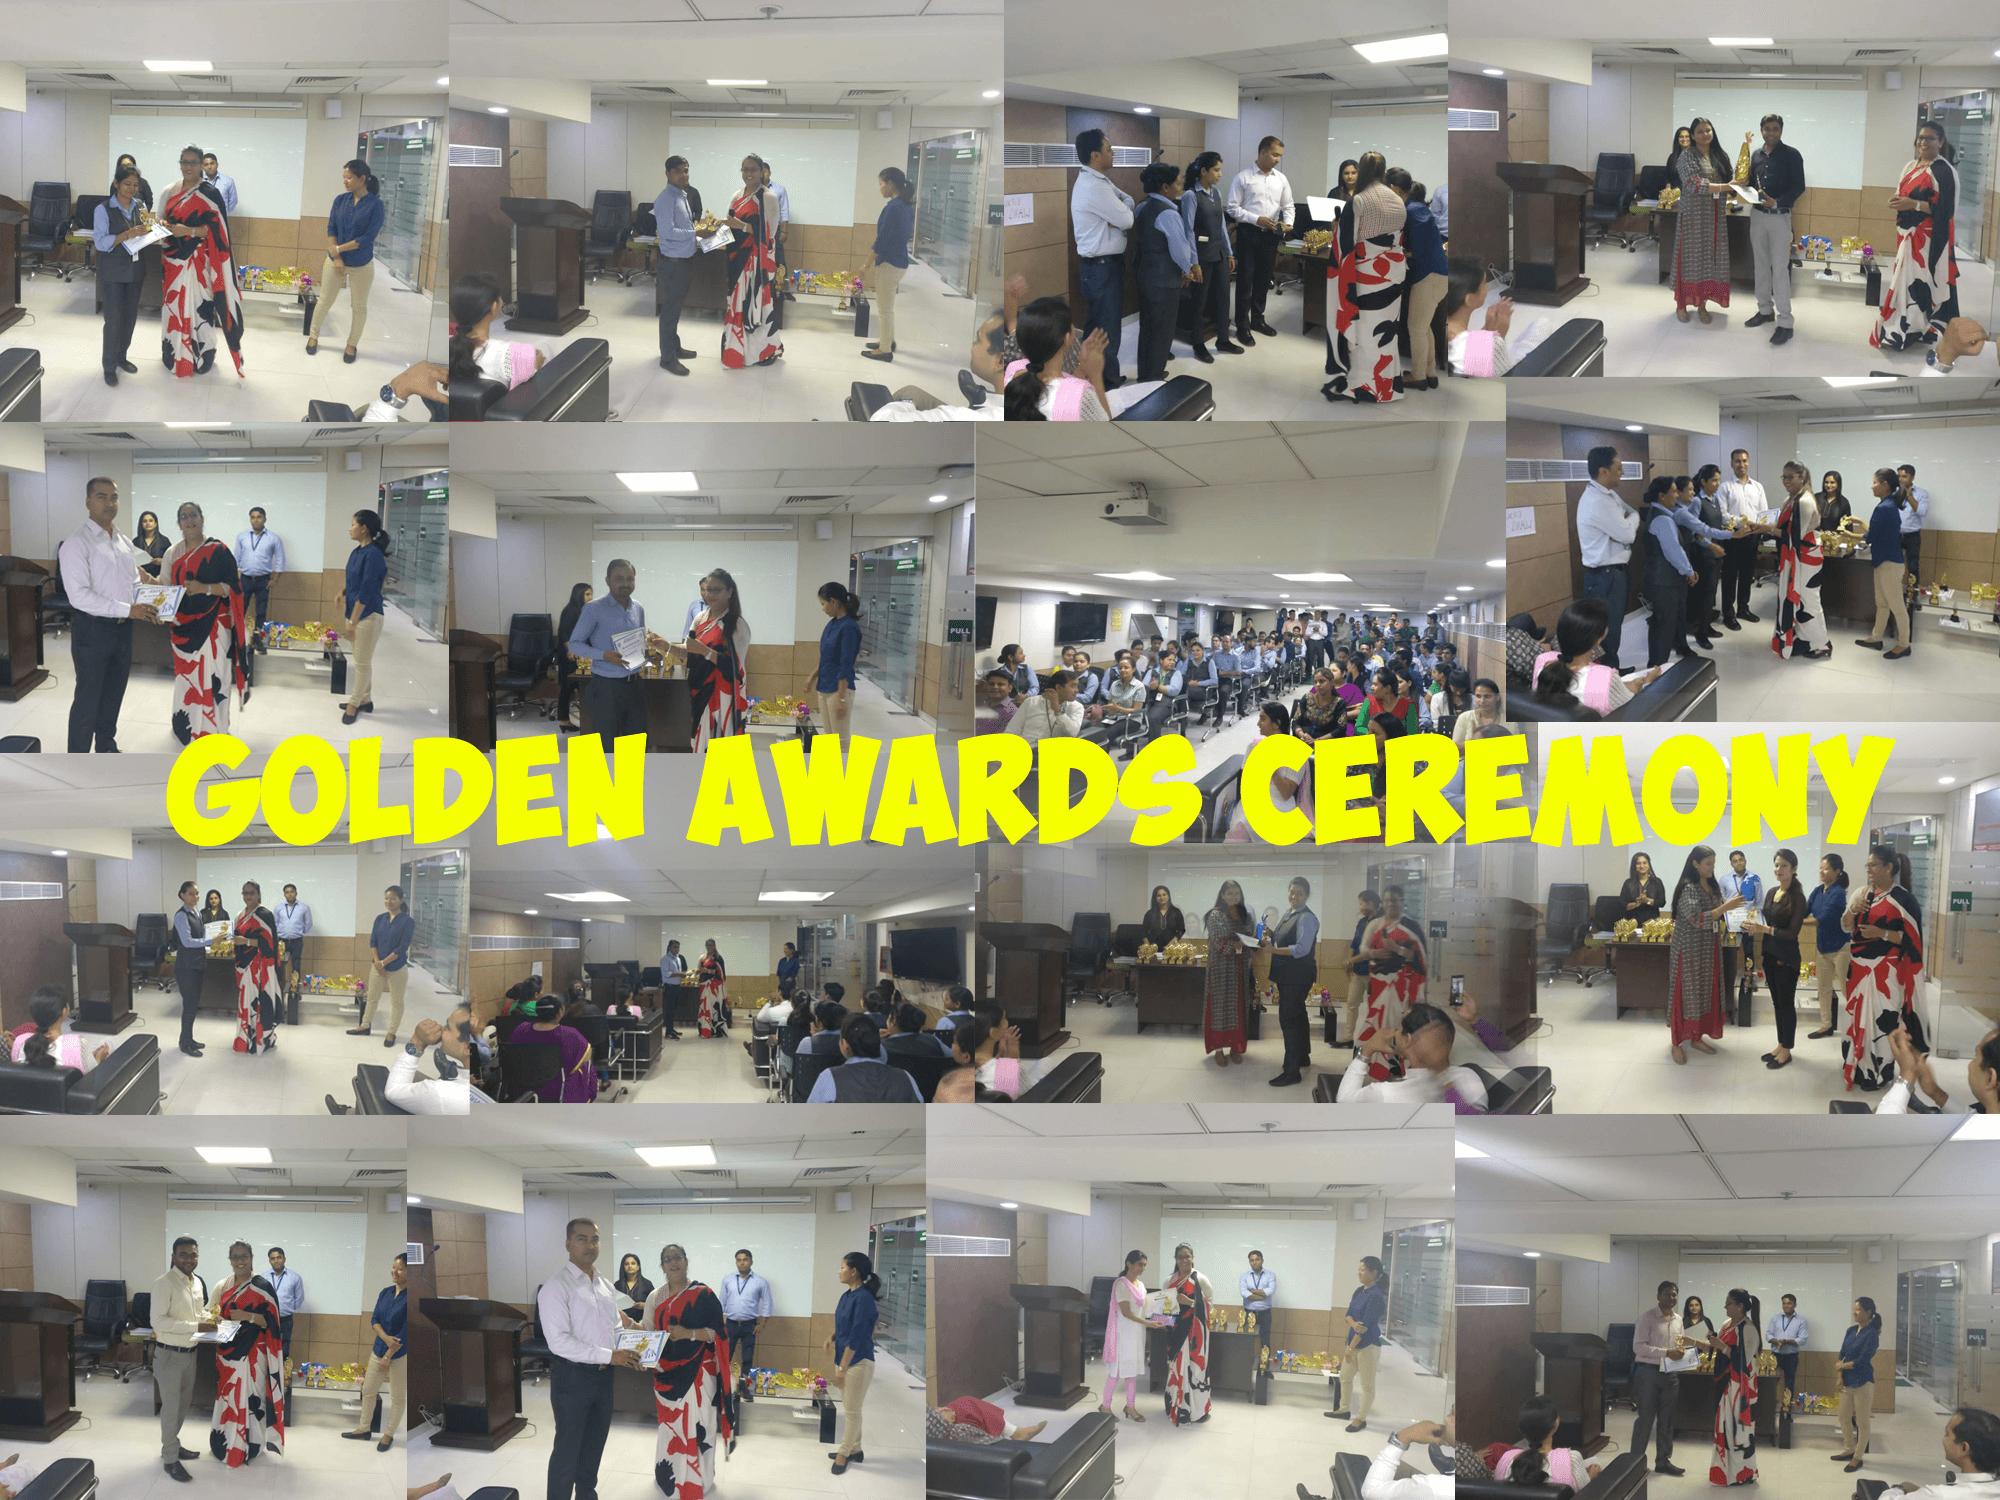 Golden-Awards-Ceremony